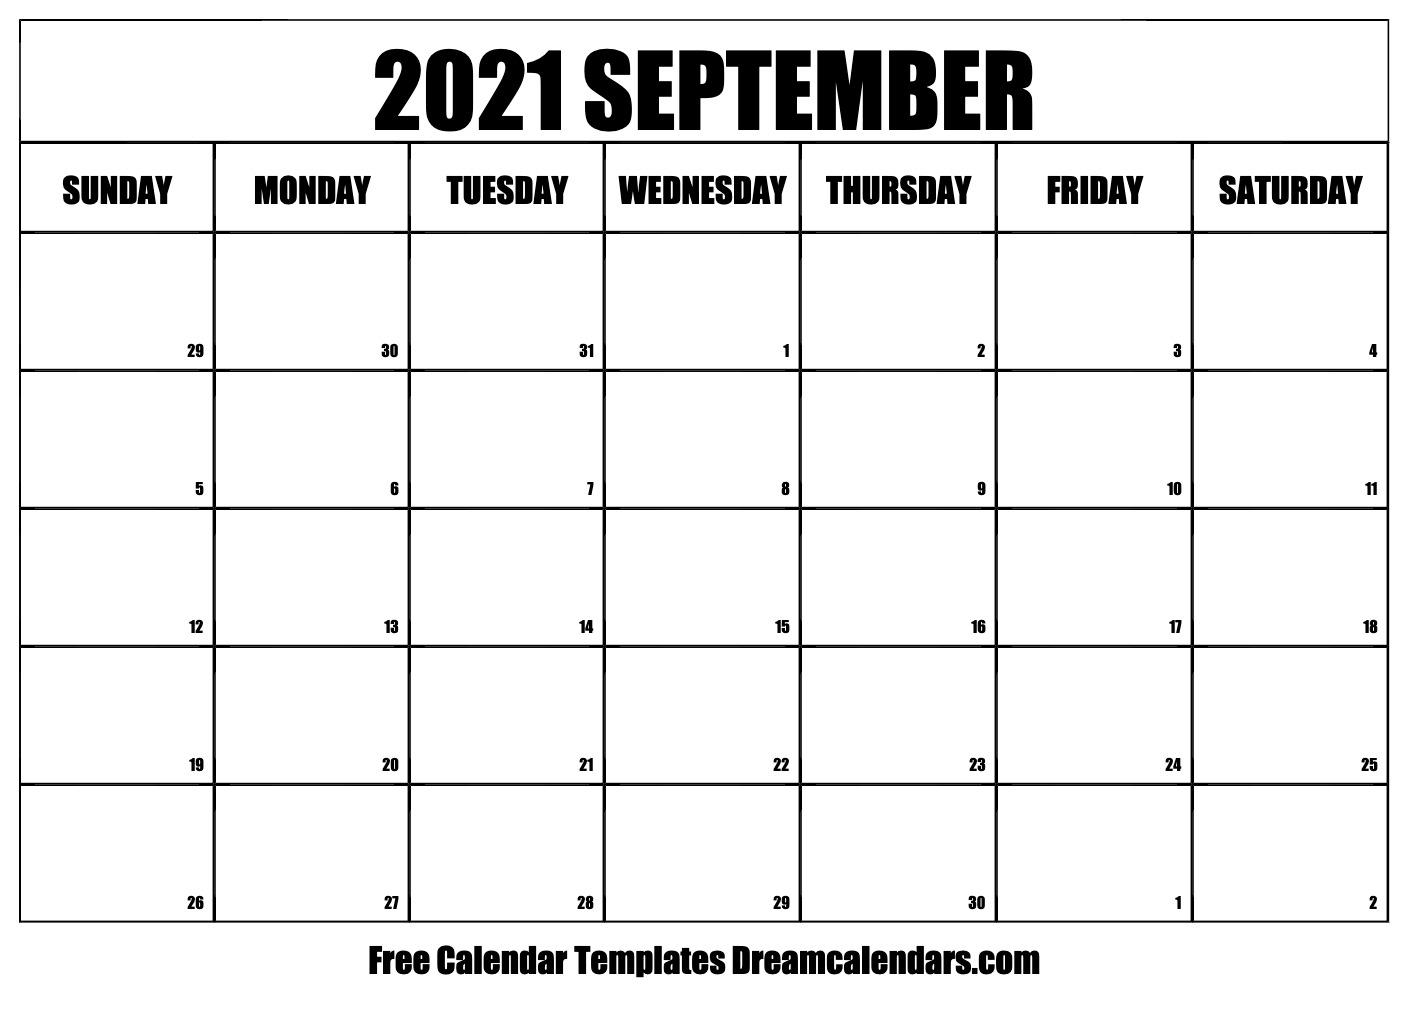 September 2021 Calendar Free Blank Printable Templates